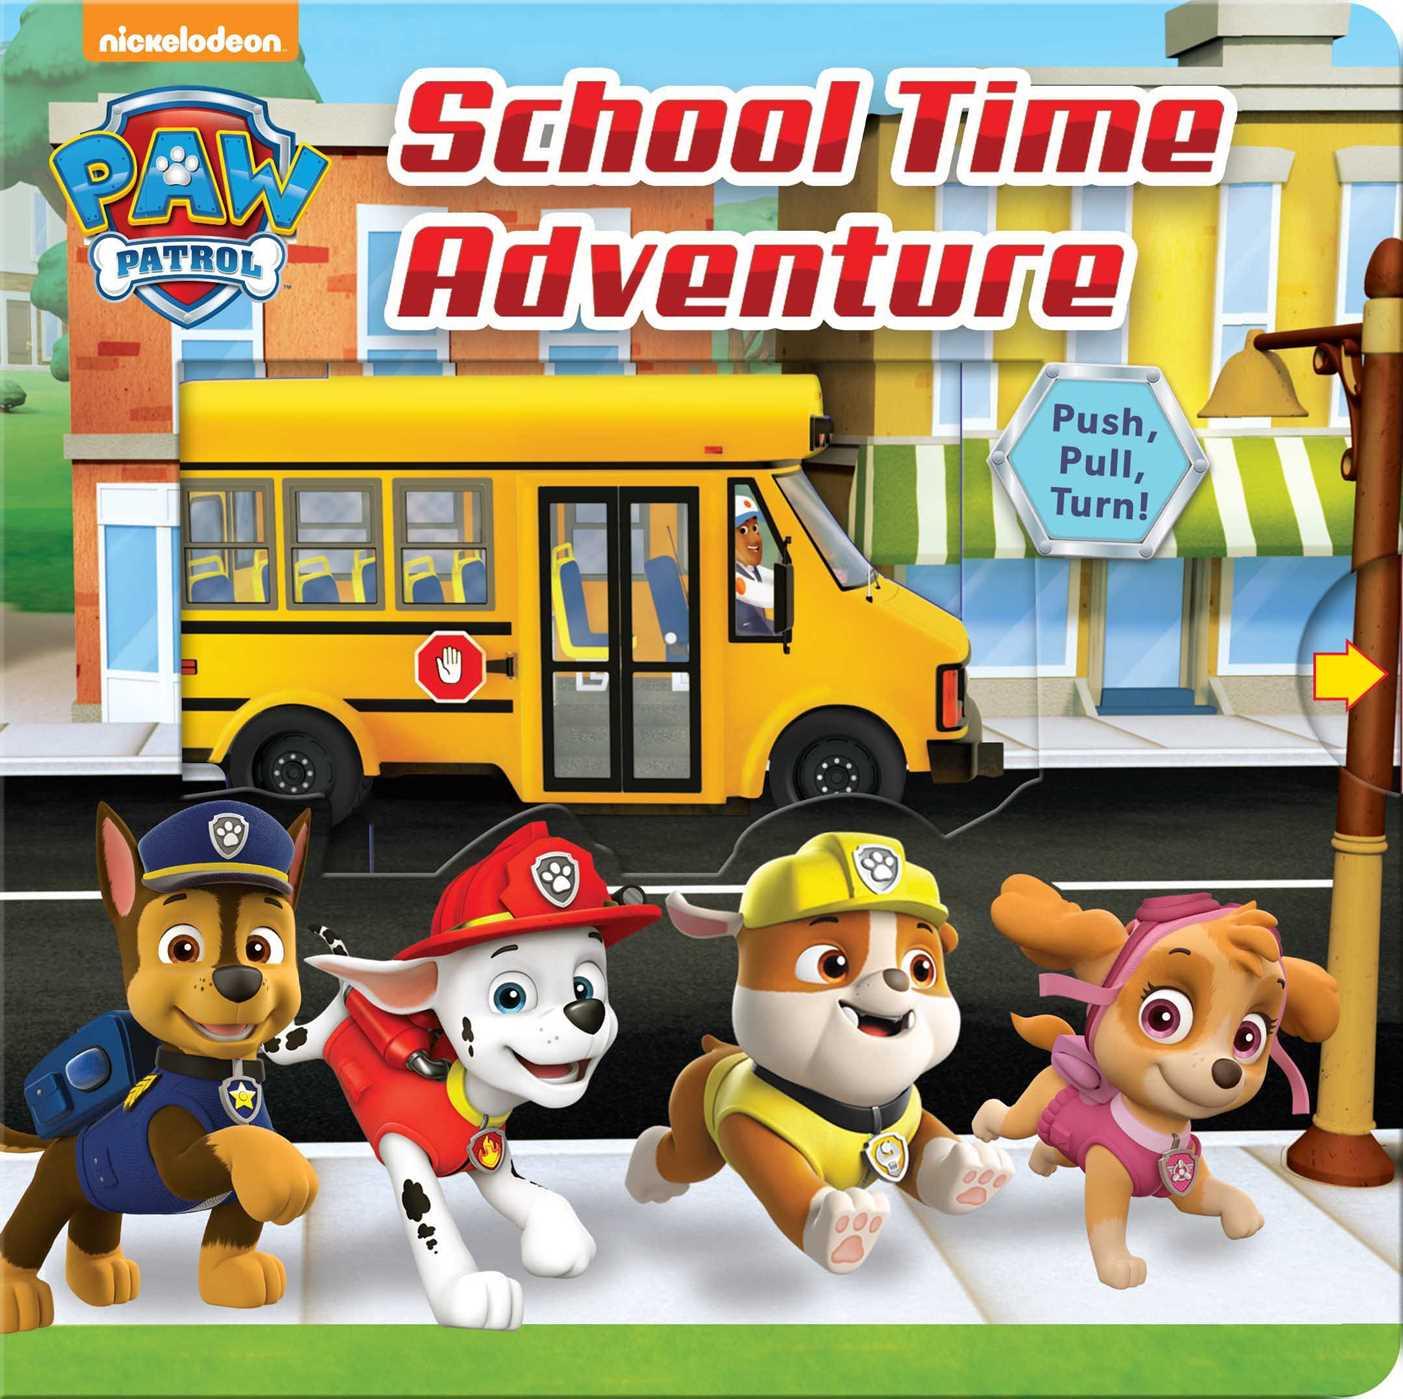 Paw patrol school time adventure 9780794440206 hr